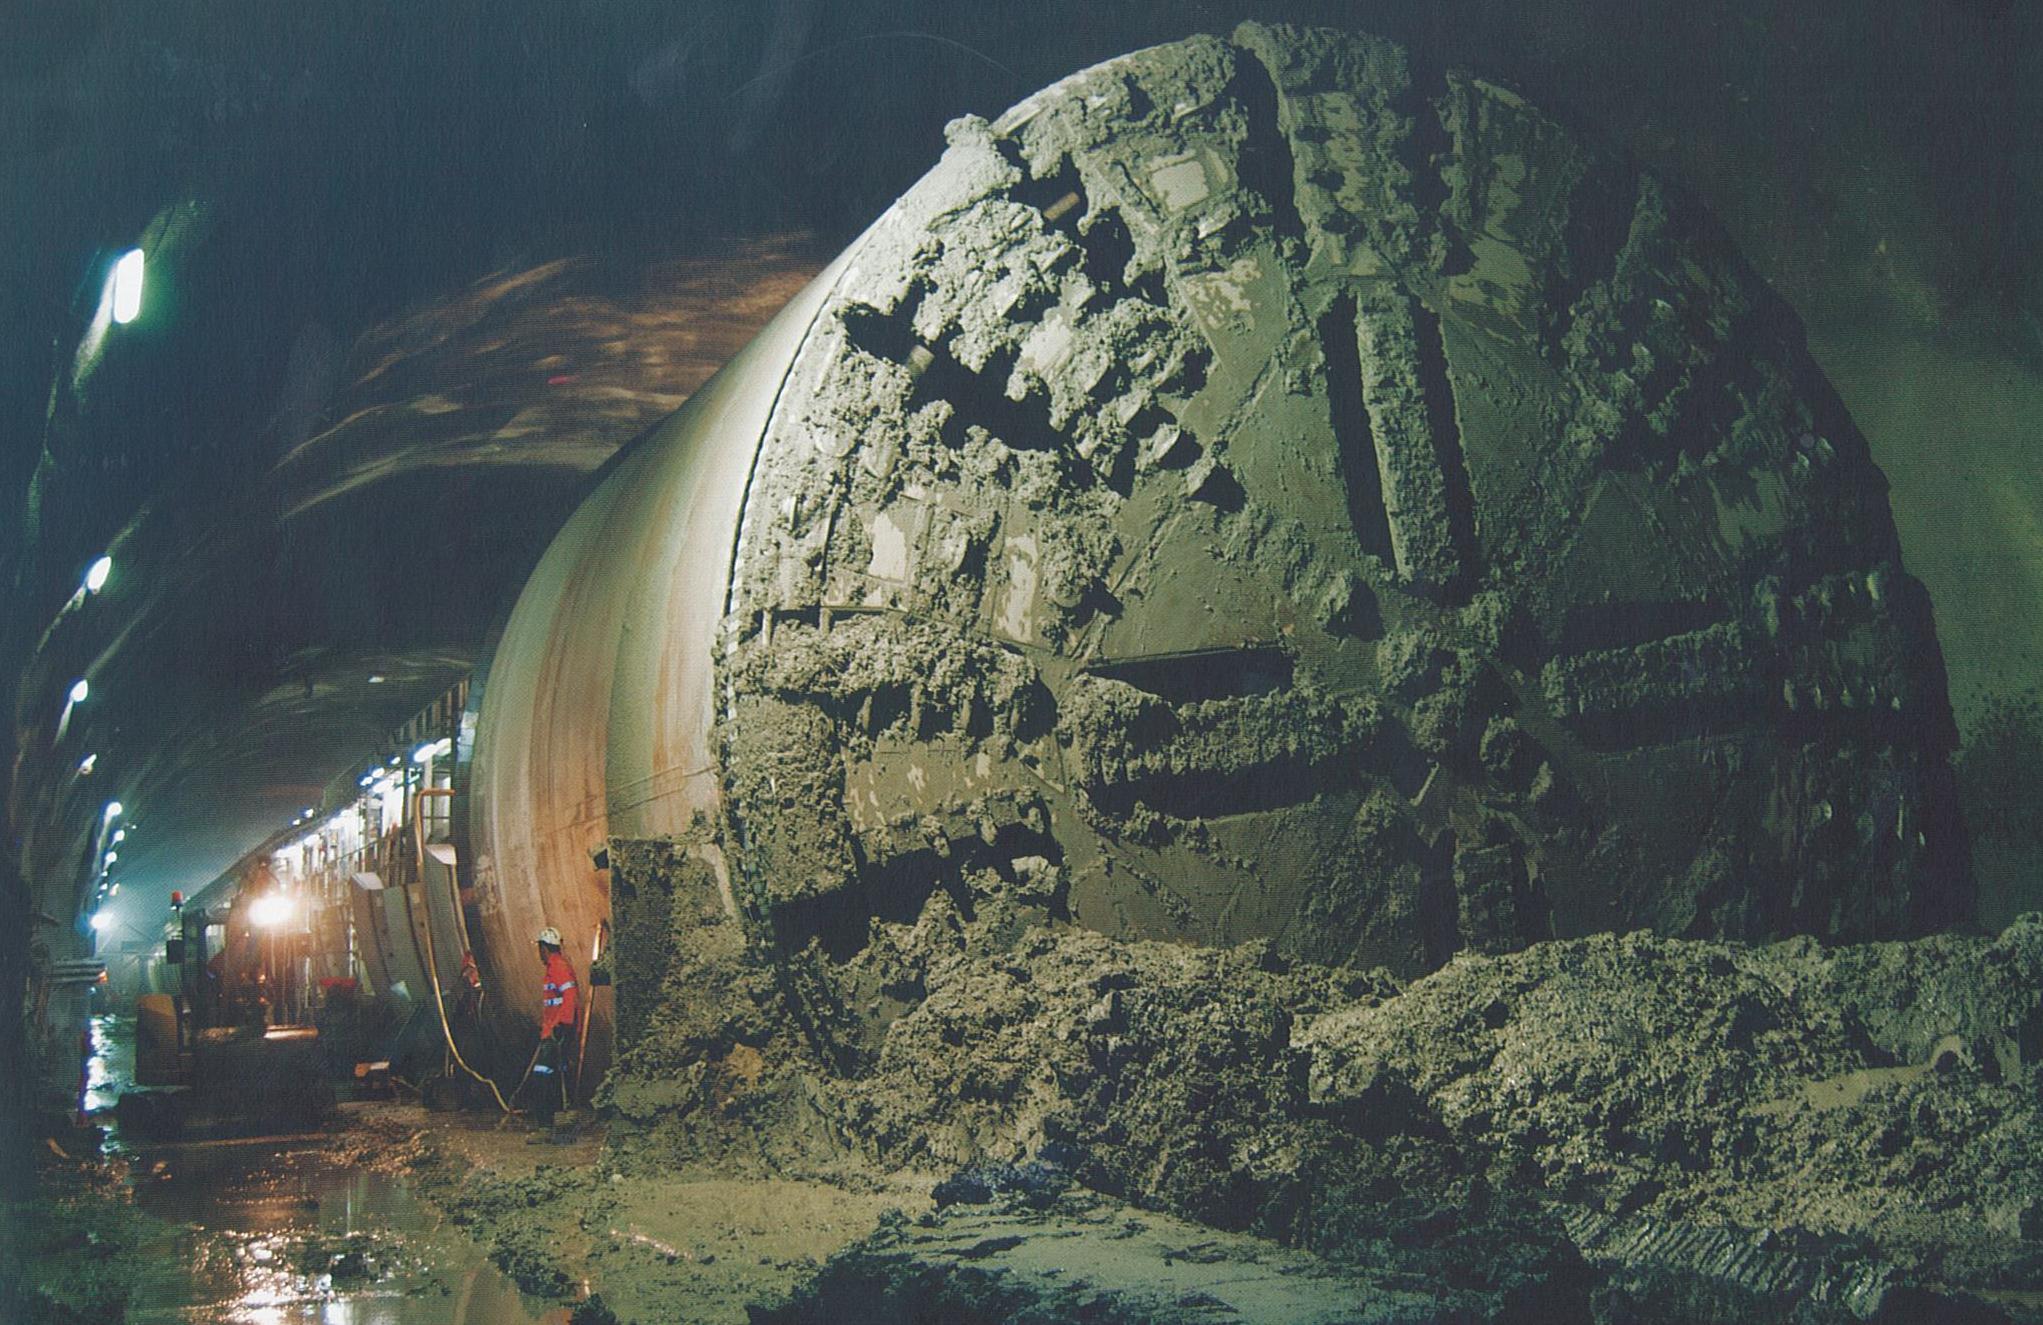 tbm-in-tunnel1.jpg